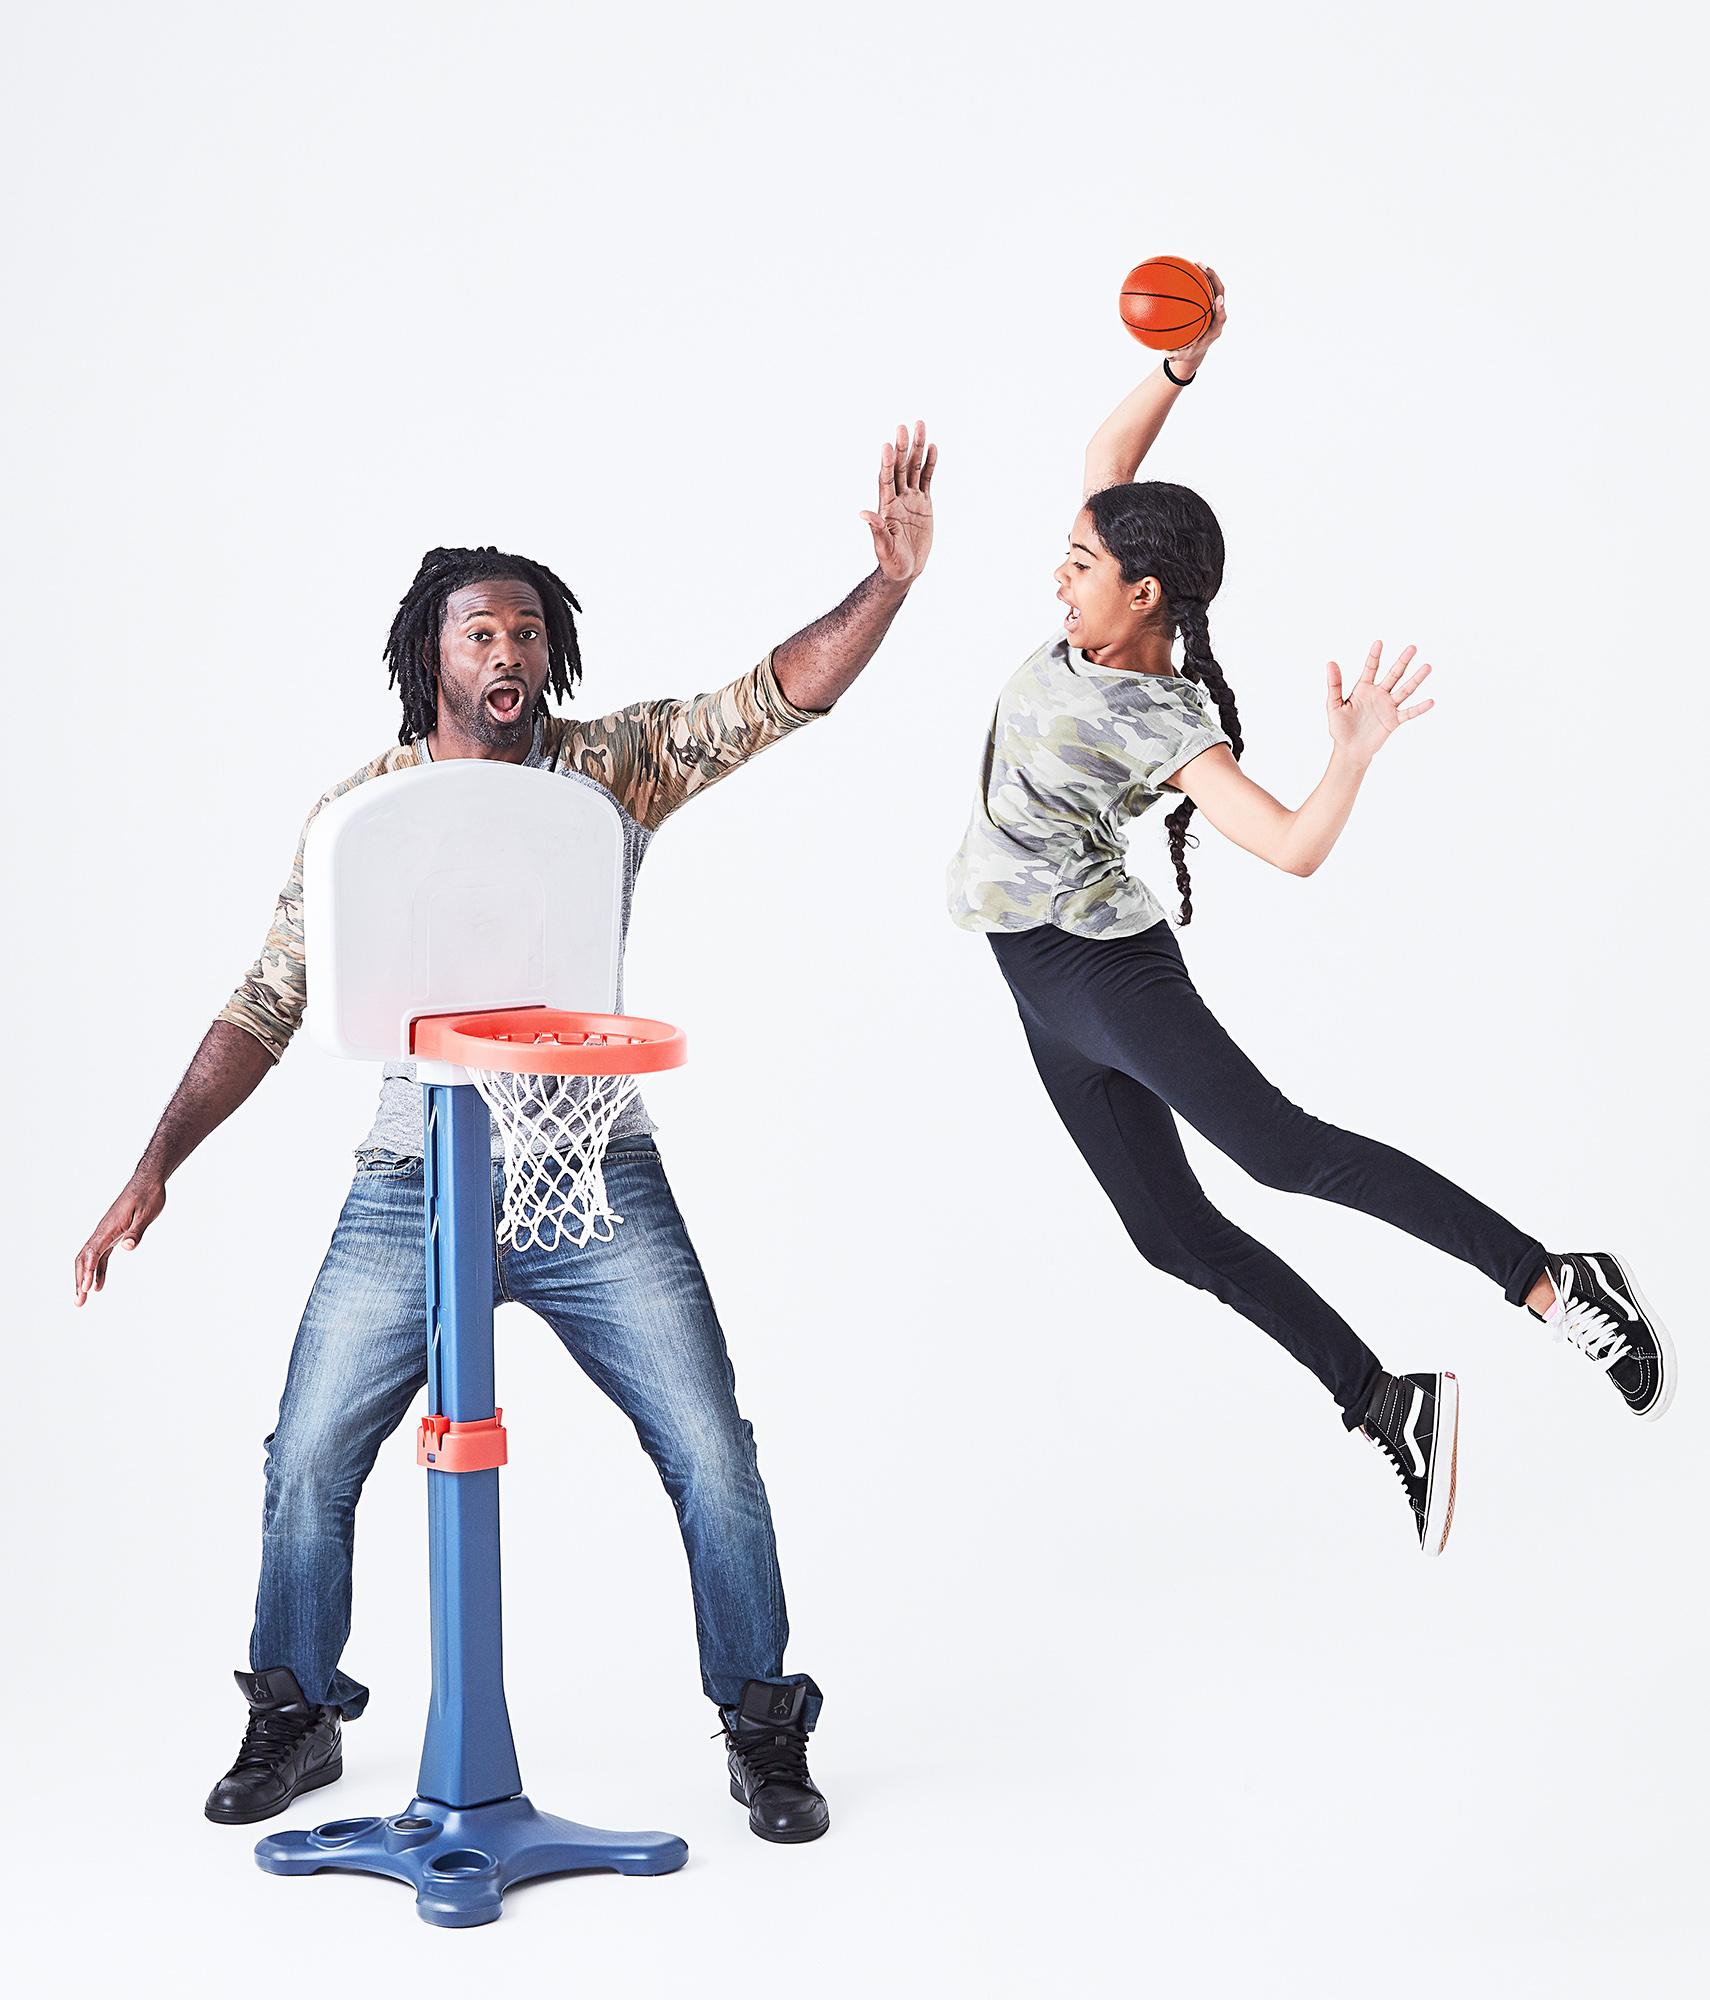 Basketball player Bobby Jones, Jr. with his daughter Aaliyah